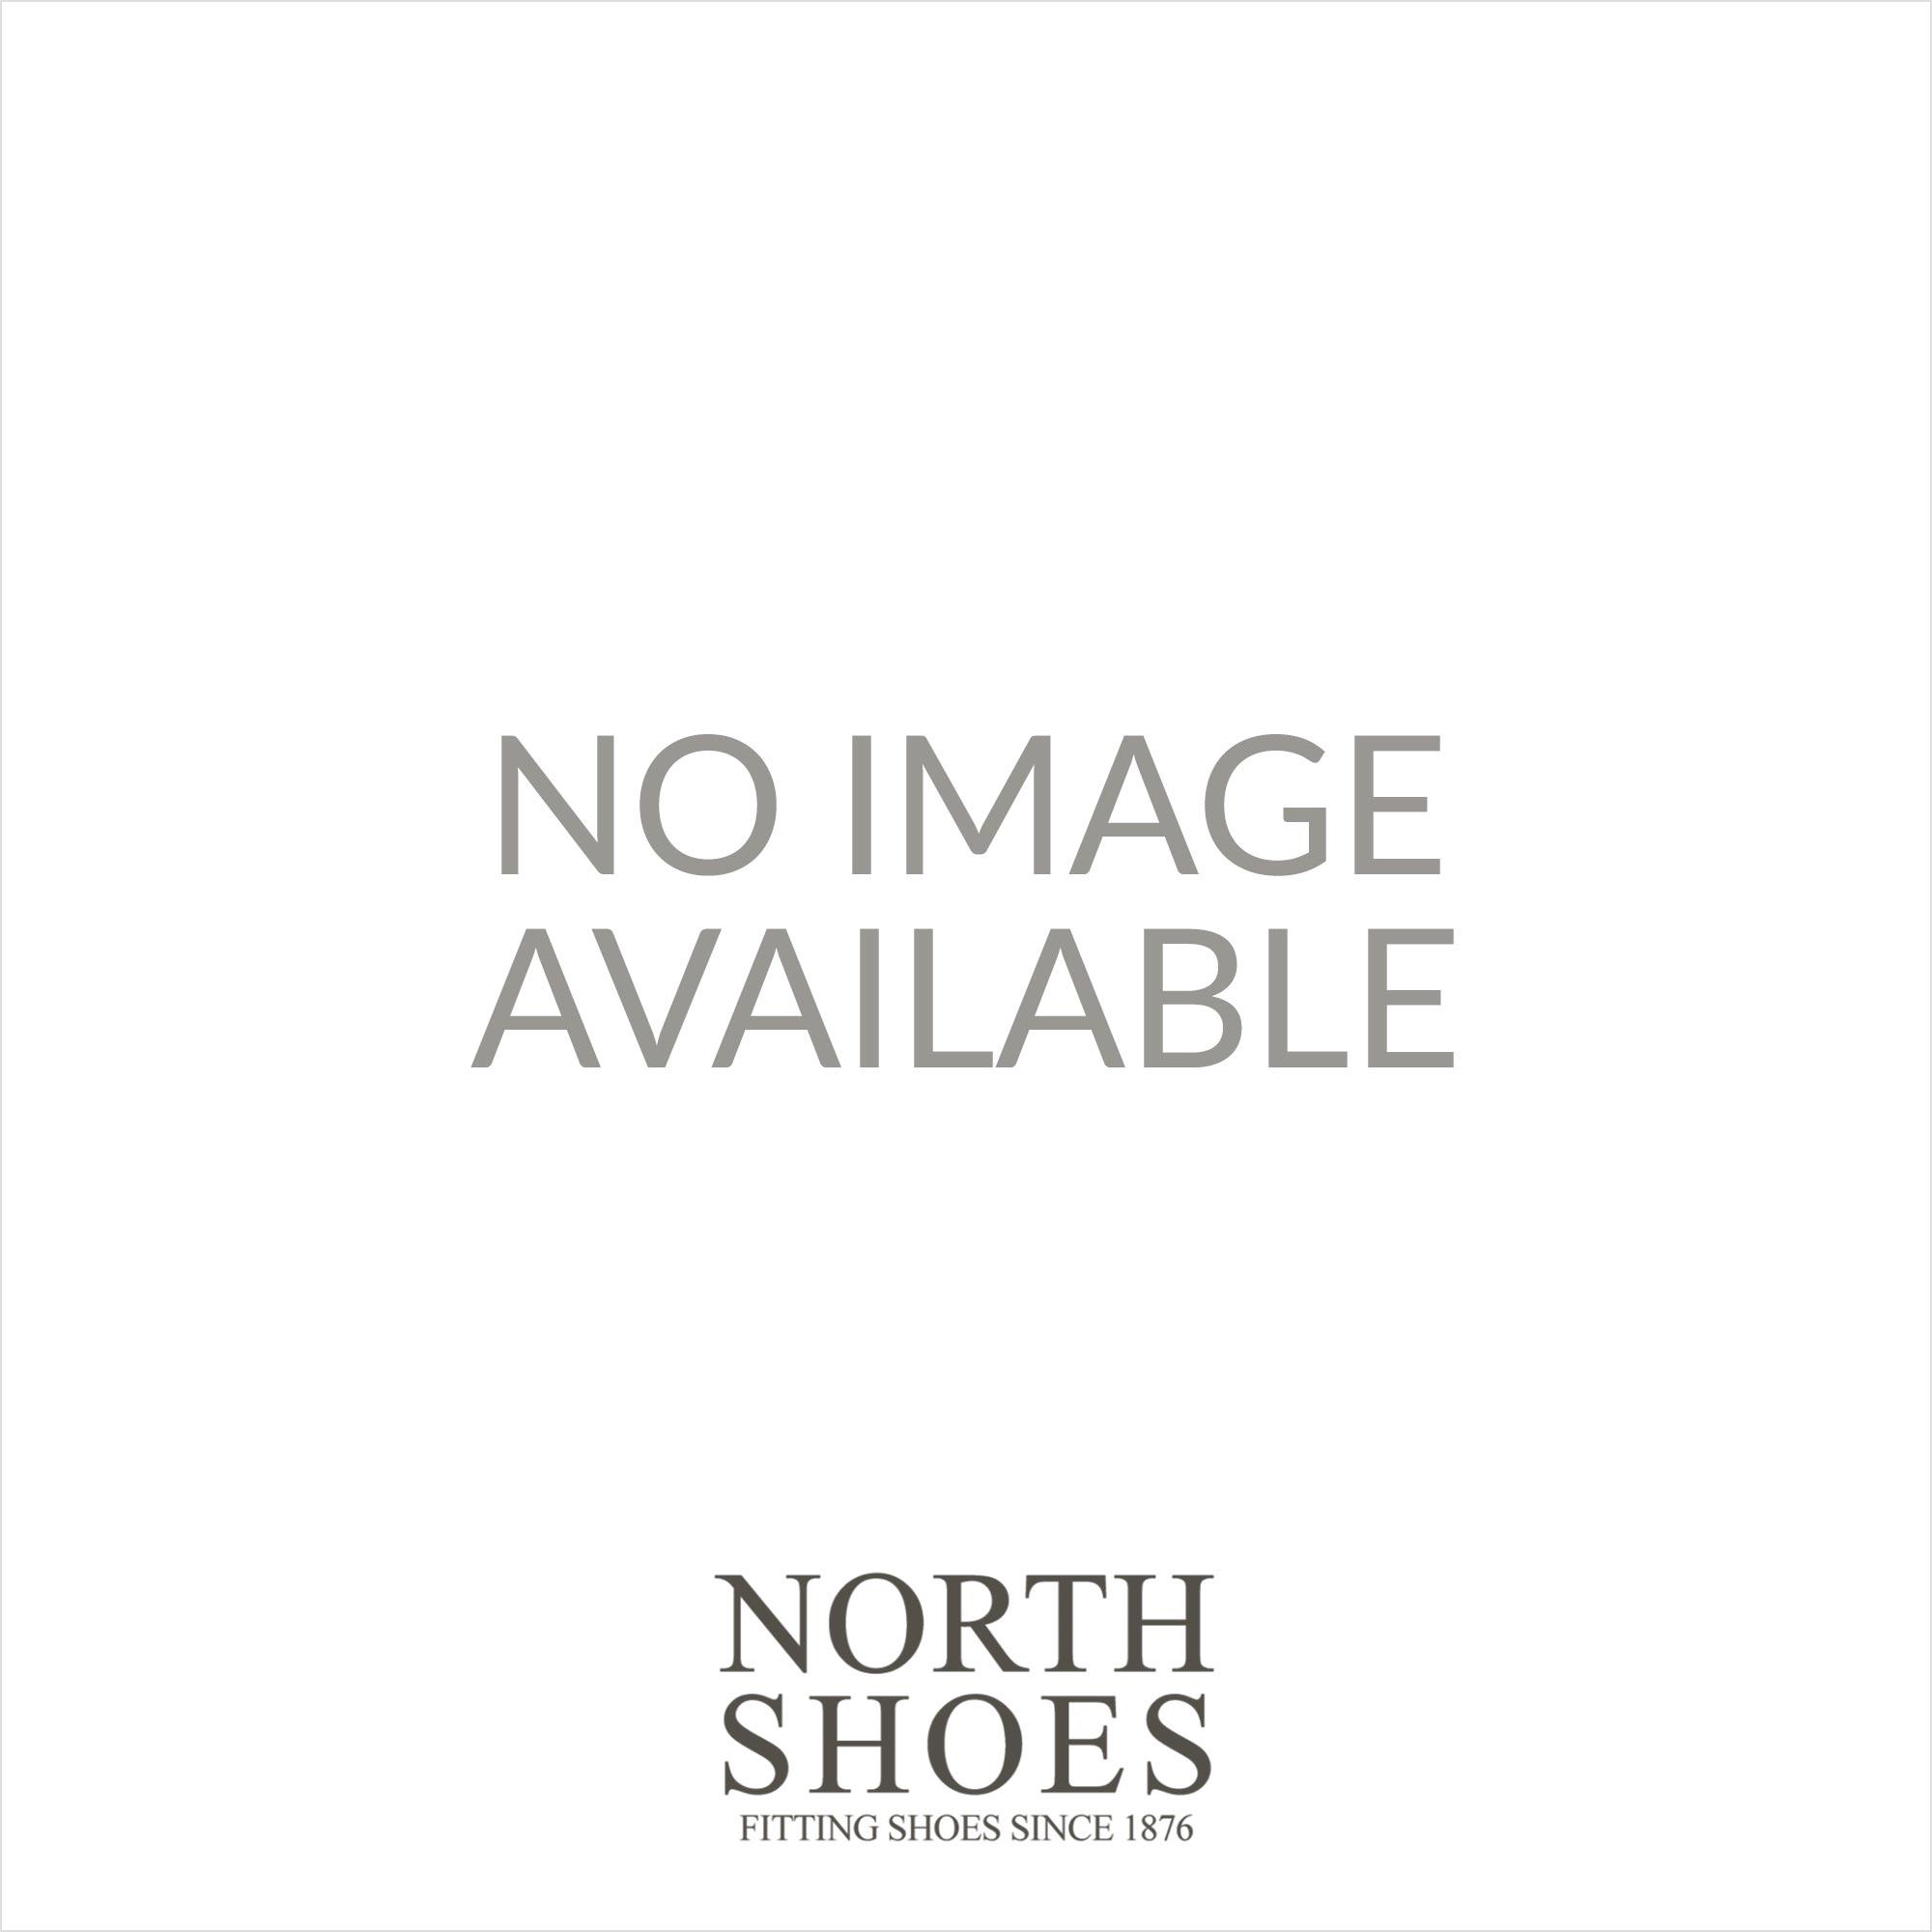 6dea8bdf8bc Toni Pons Etna Platinum Gold Leather Womens Espadrille Sandal